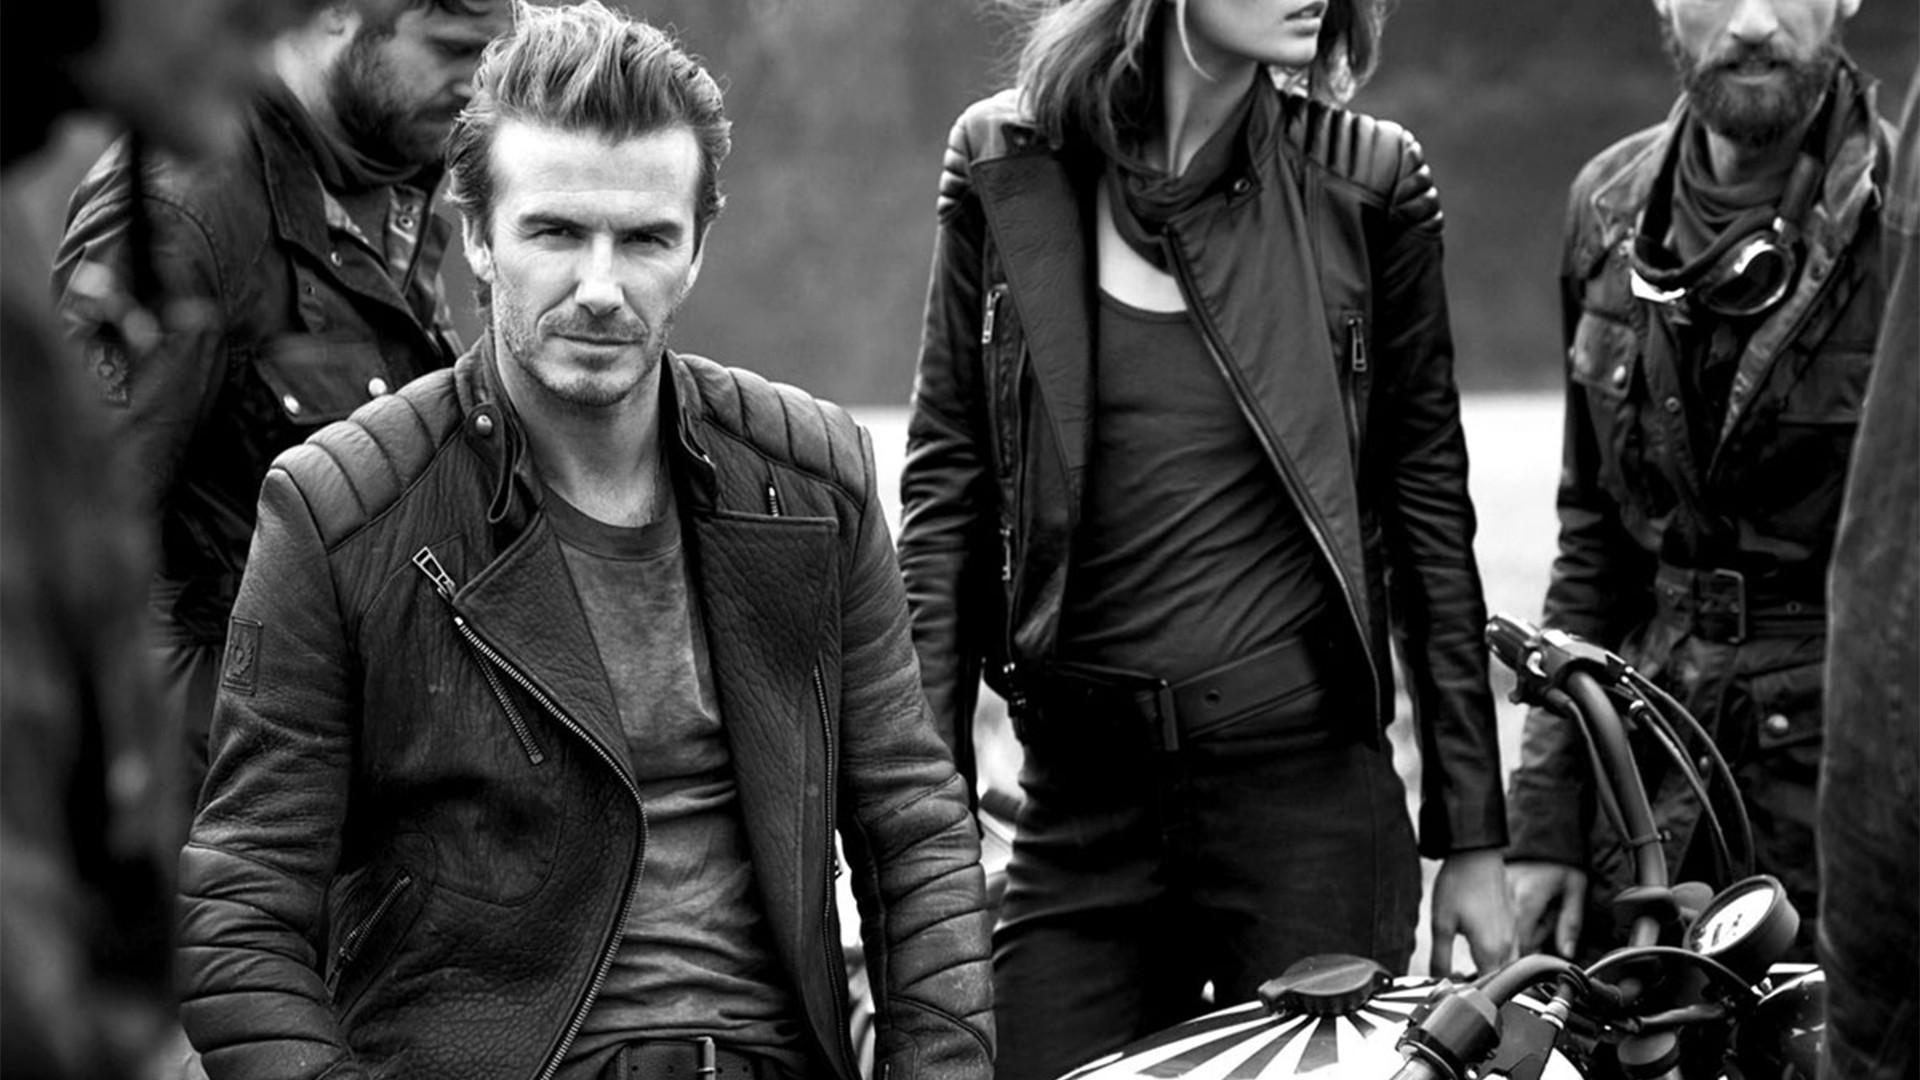 David Beckham Wallpapers 49 Pictures